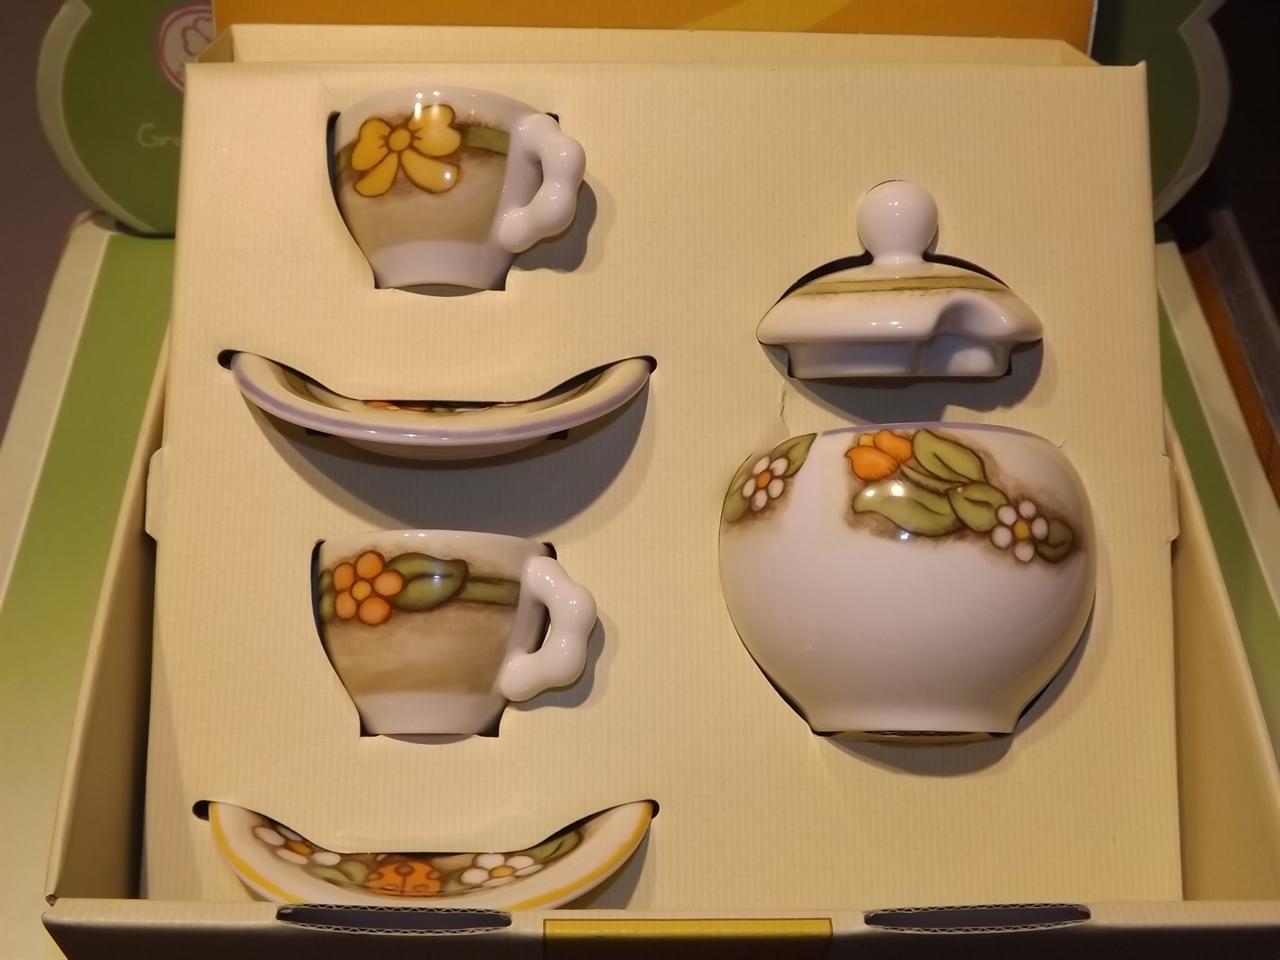 Emejing thun cucina prezzi ideas home interior ideas for Saldi thun amazon